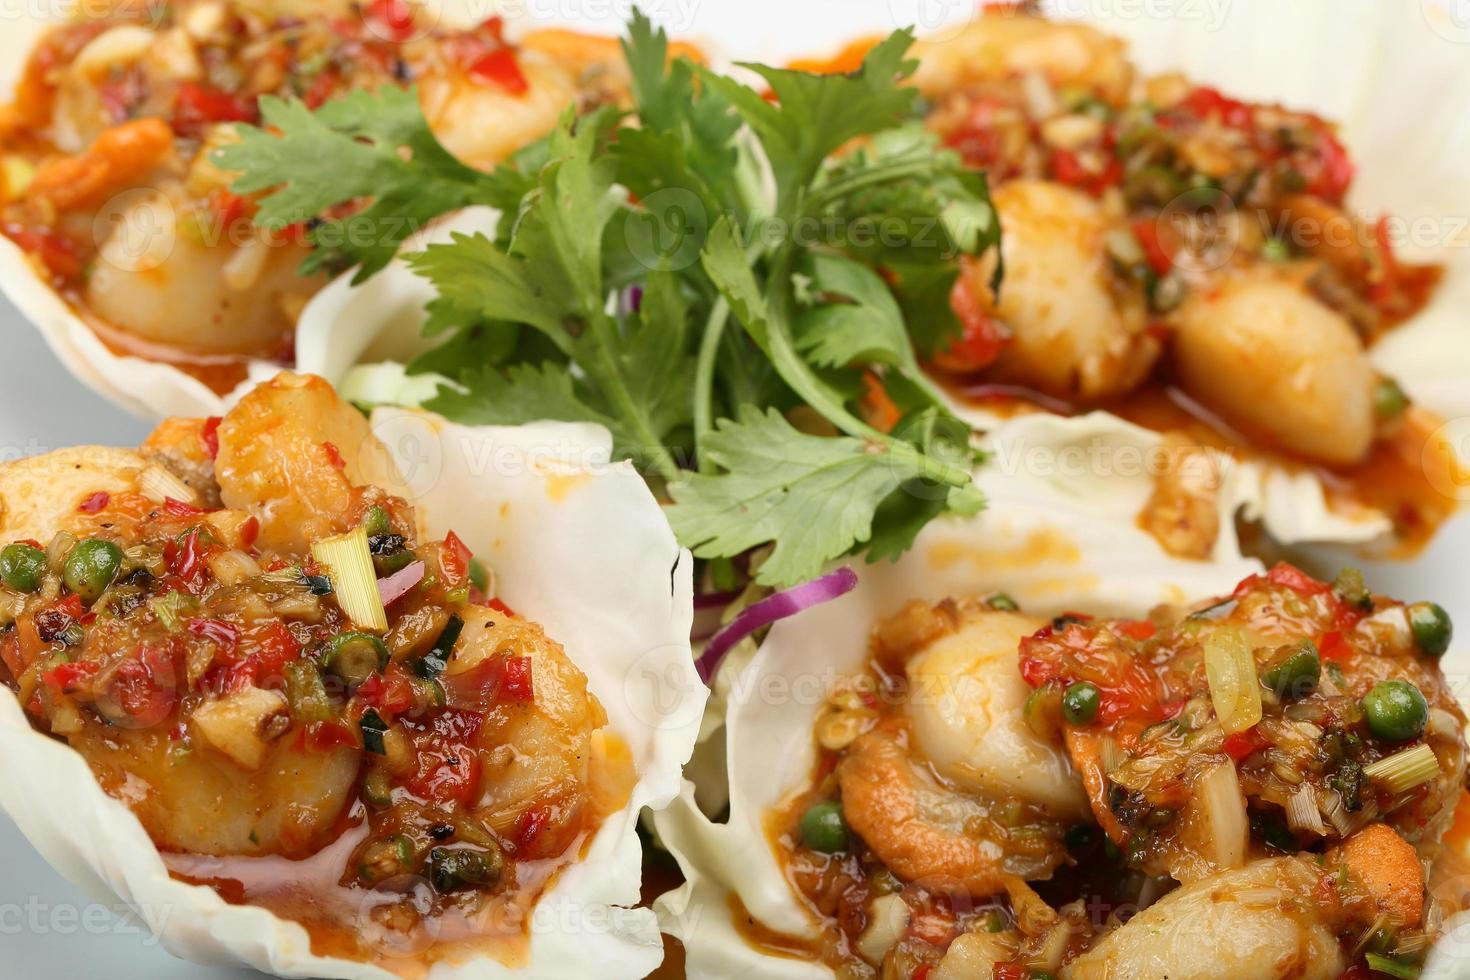 würzige Meeresfrüchte auf Salatblatt gebraten foto